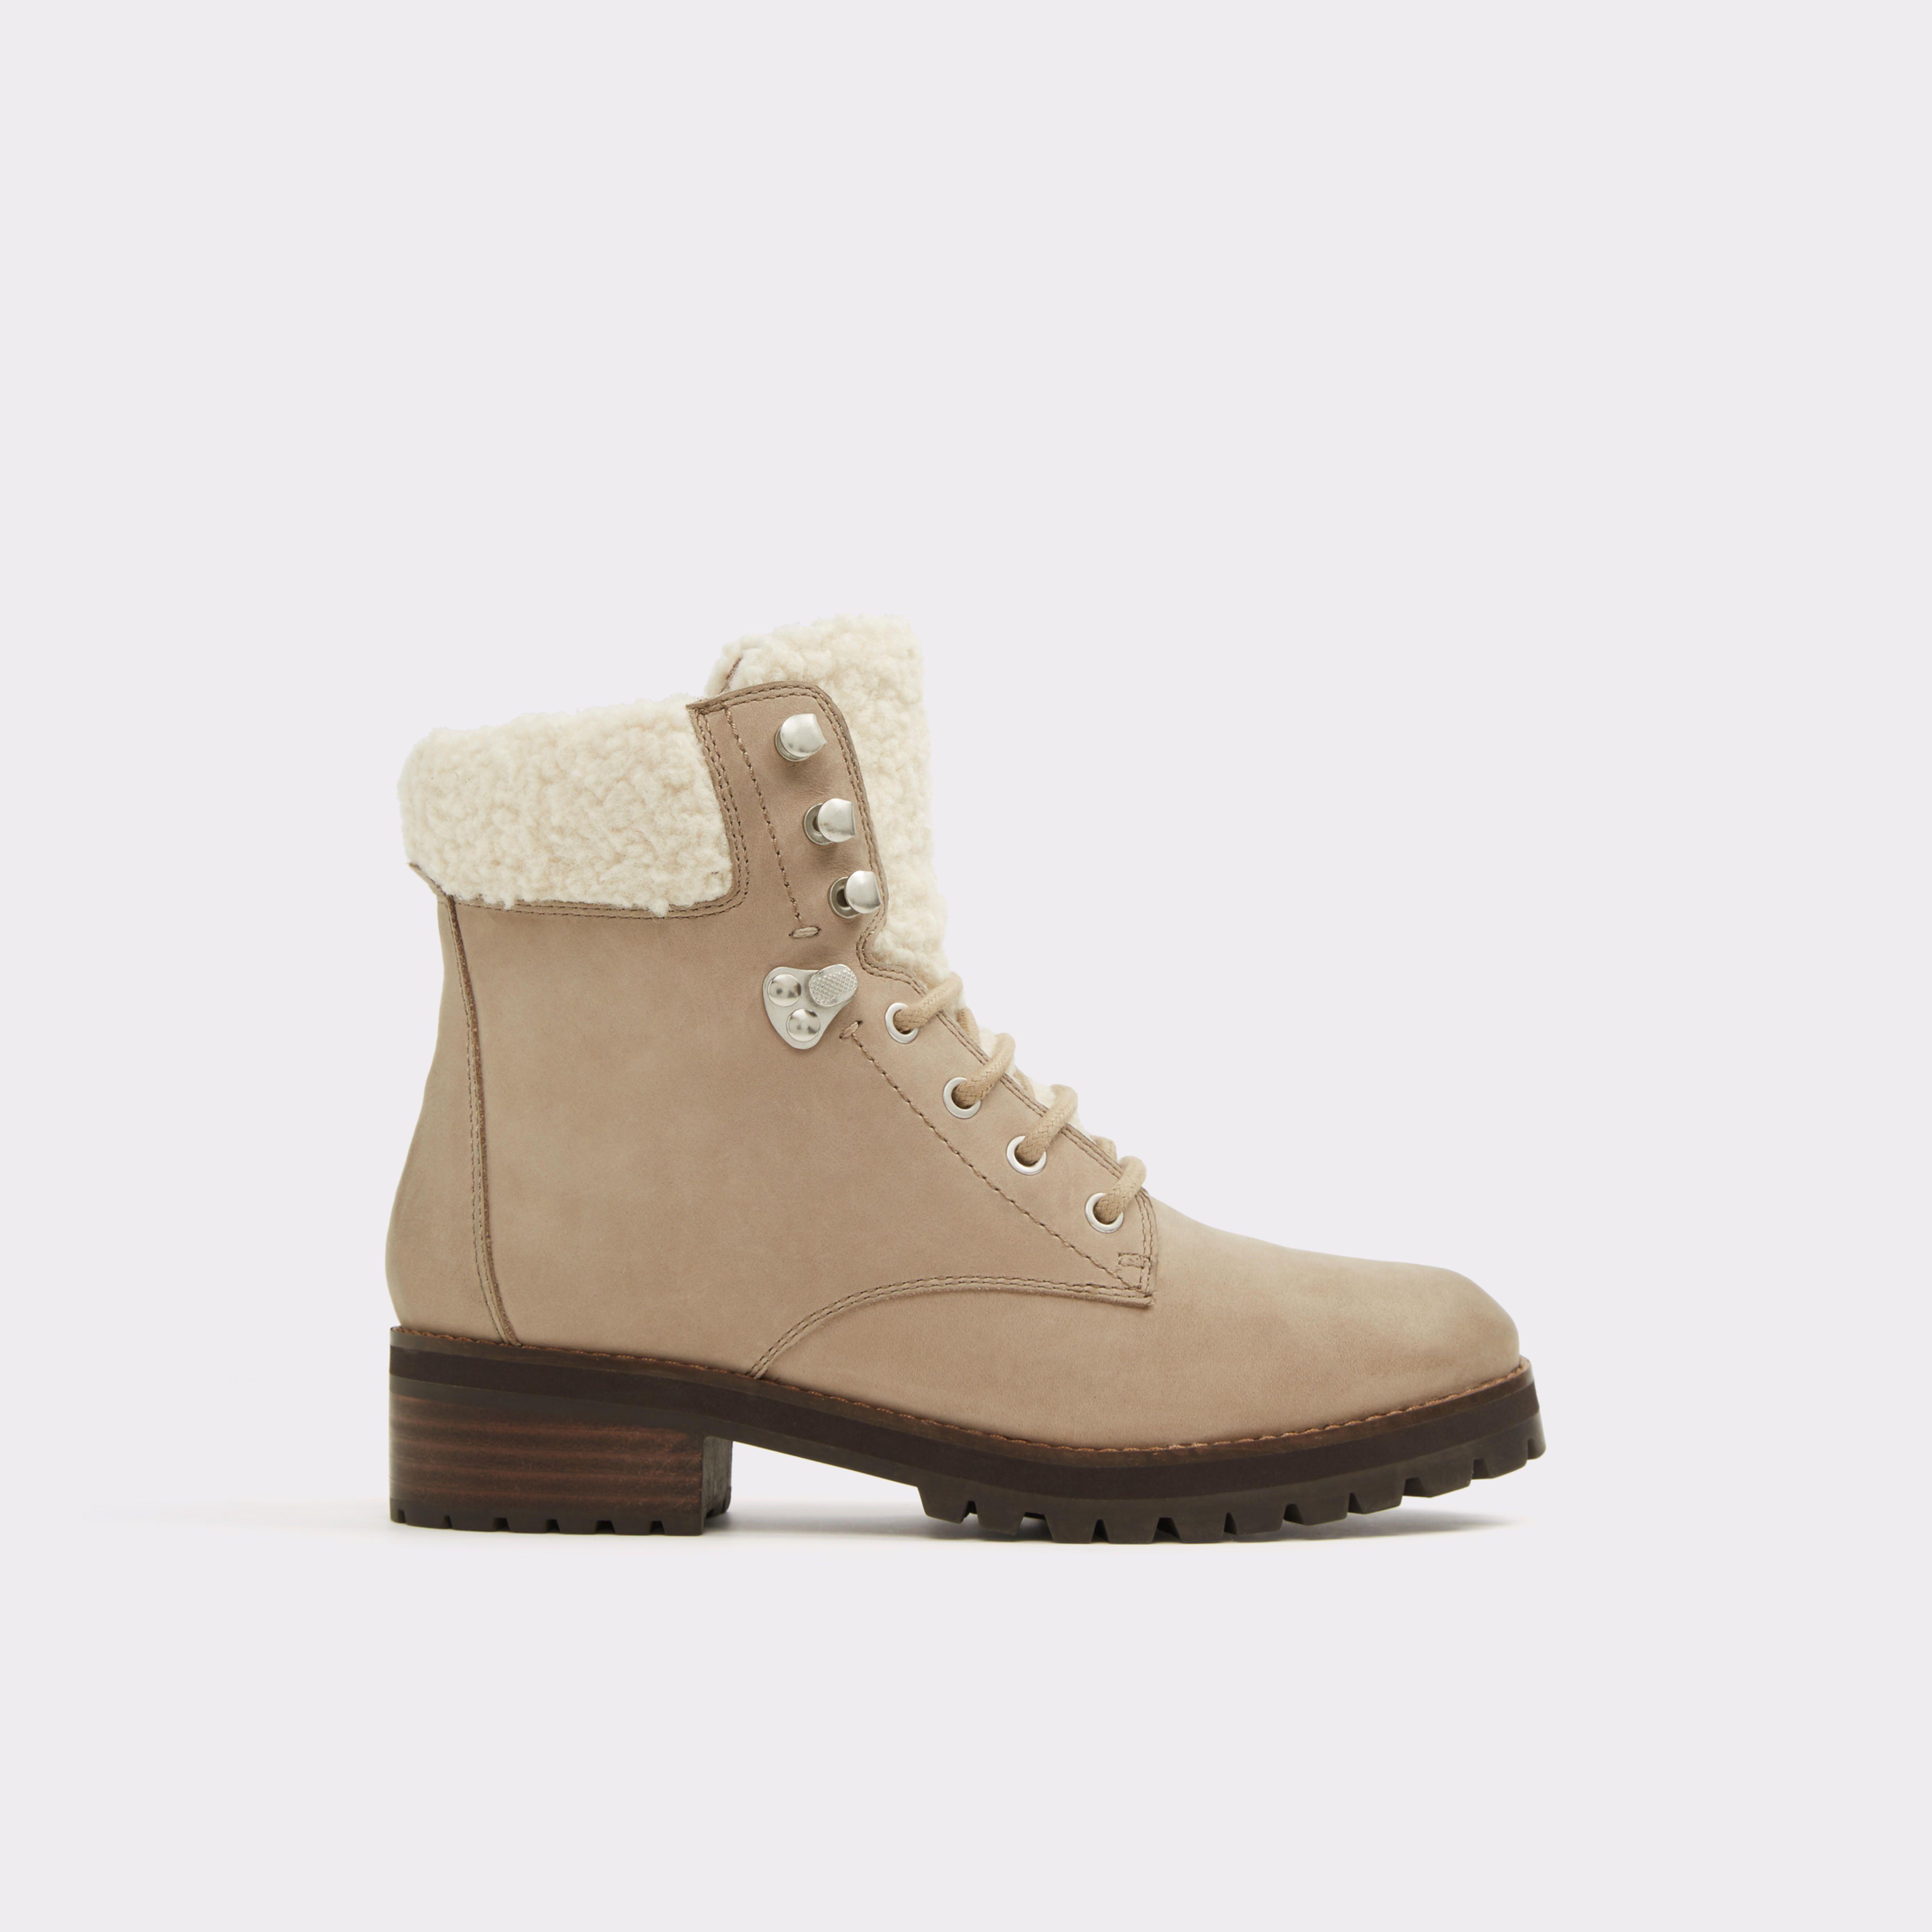 1edfec530fc Uleladda Taupe Women s Ankle boots